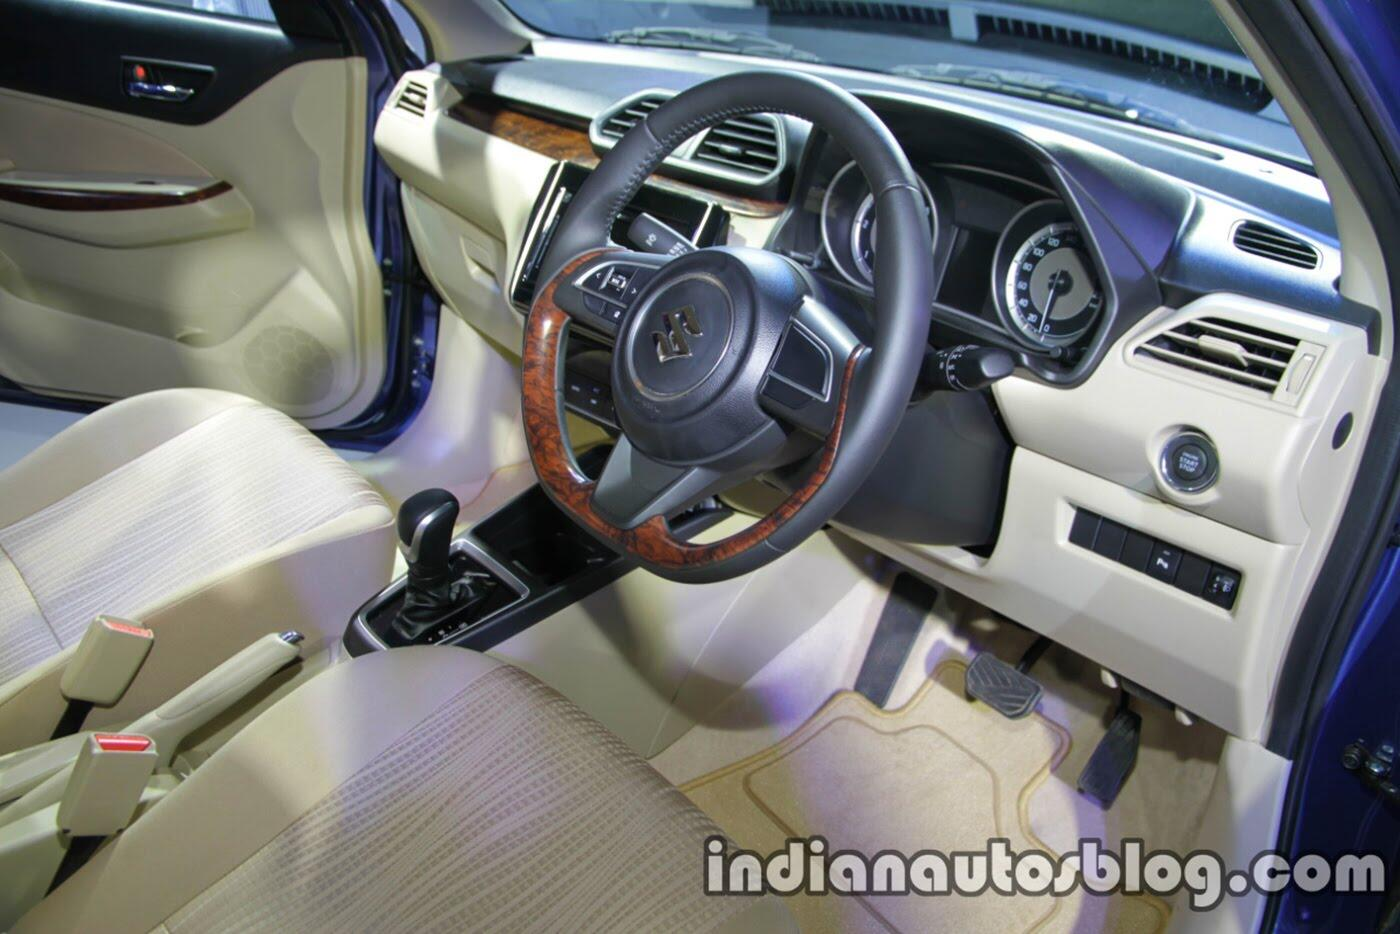 Xem thêm ảnh phiên bản sedan của Suzuki Swift 2018 - Hình 9